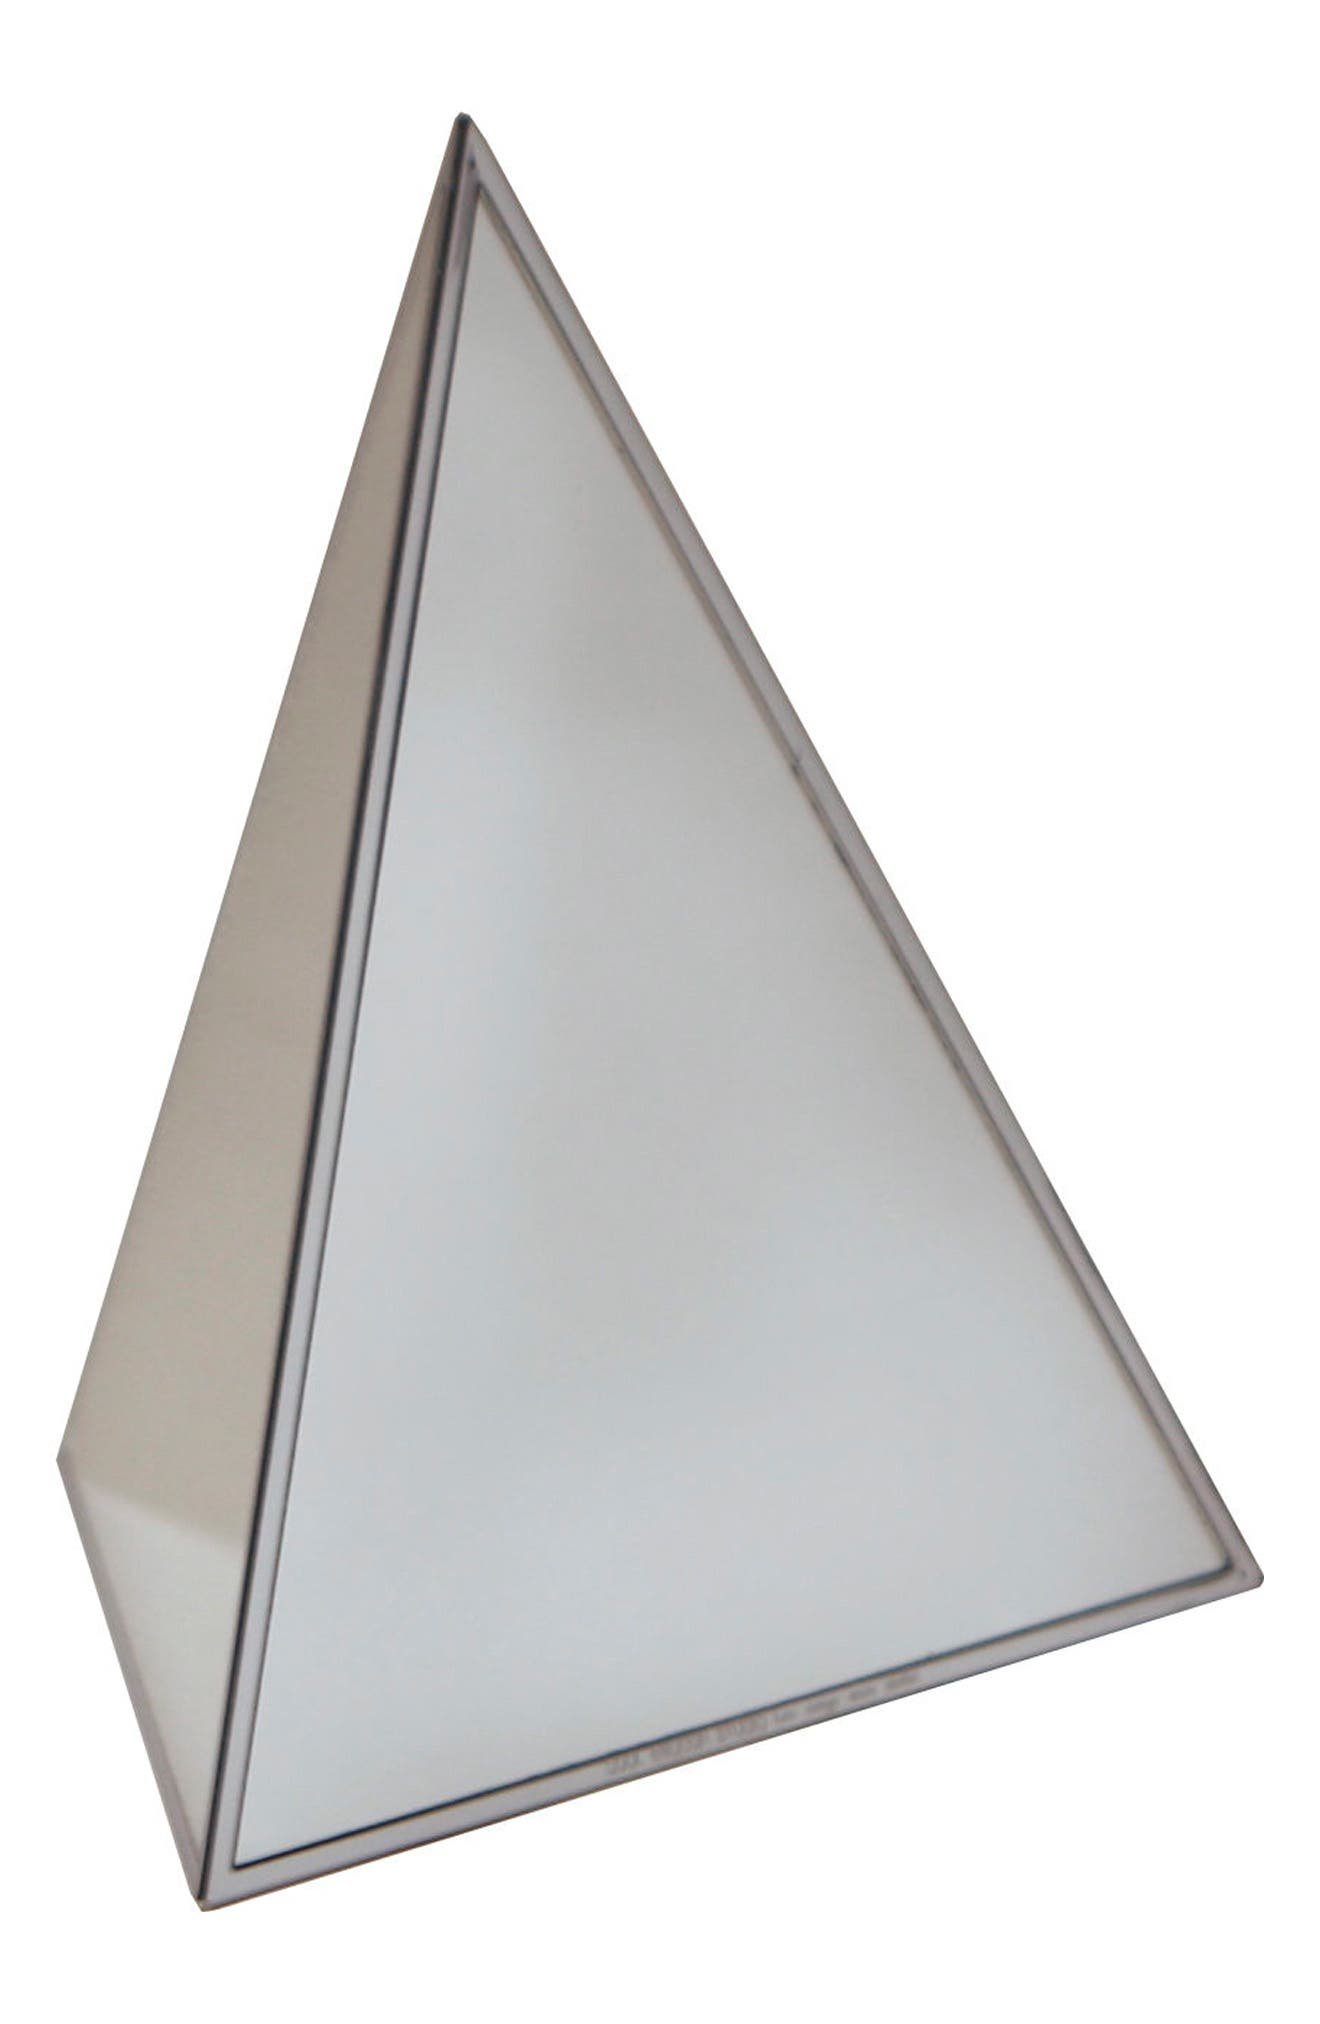 Main Image - Cool Enough Studio The Mirror Table Mirror